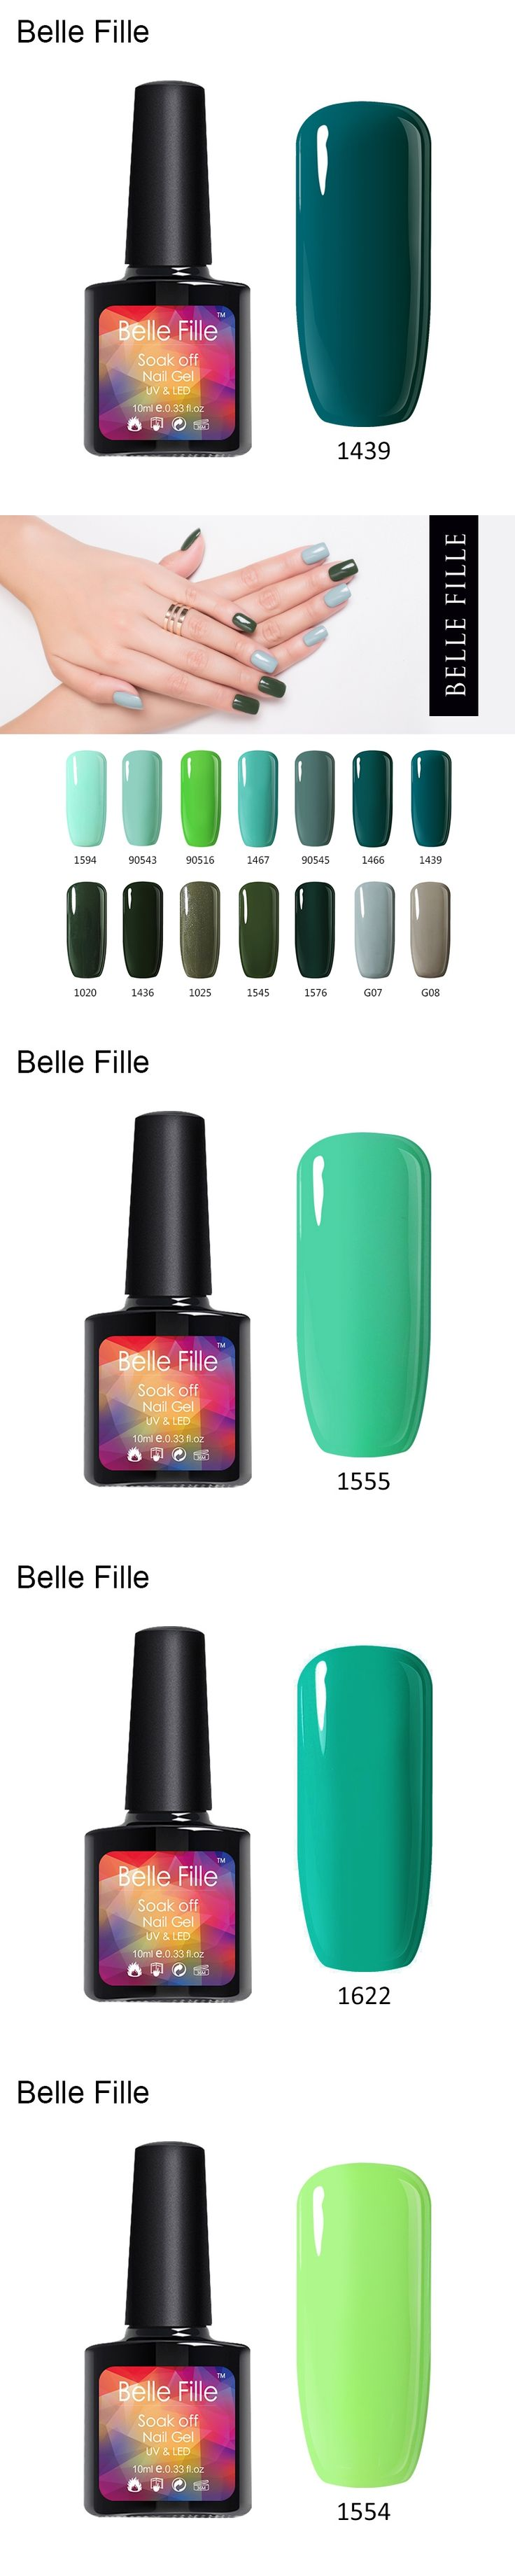 BELLE FILLE UV Gel Nail Polish 10ml UV LED Nail Gel dark green Color Lacquer Gelpolish Varnish Professional fingernail Polish